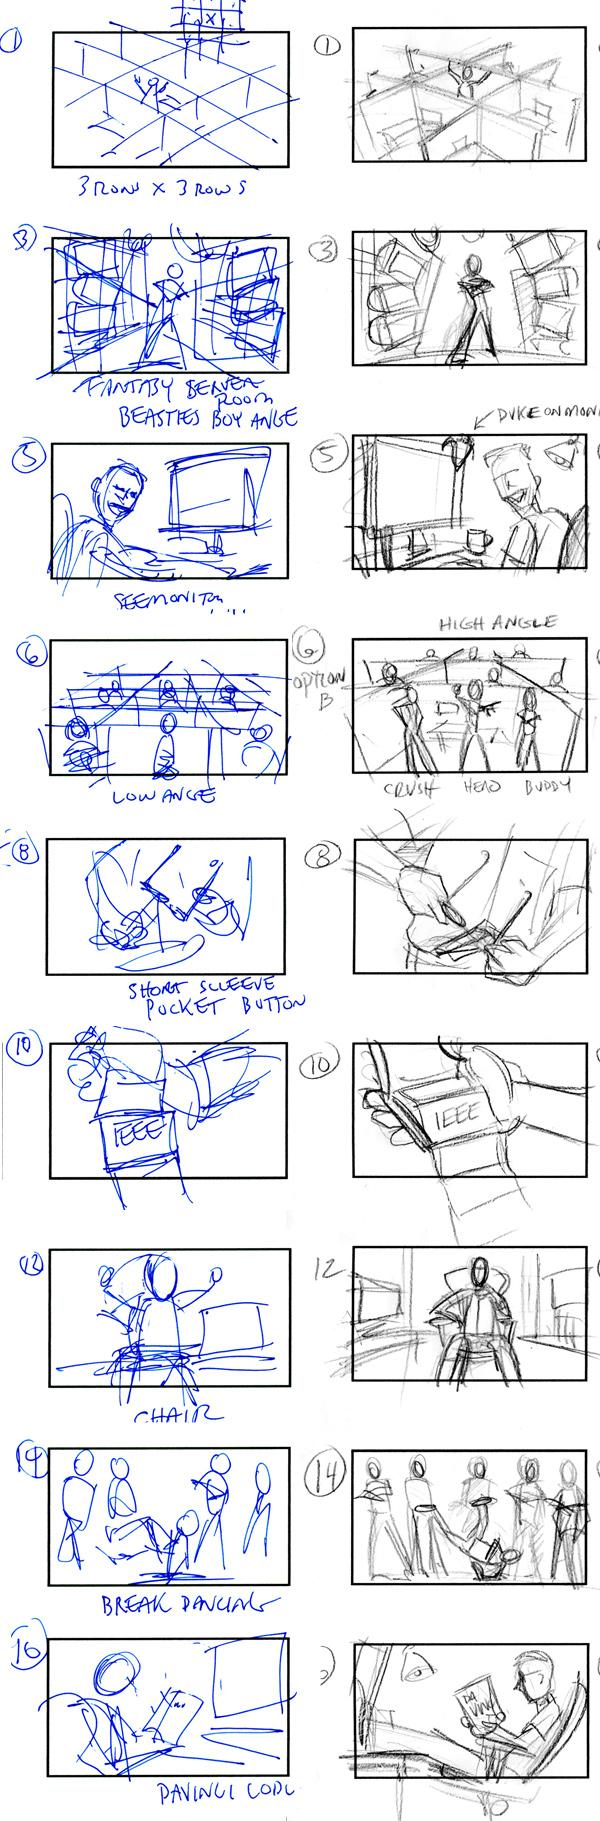 Java Life Oracle Rap Video Storyboard Thumbs